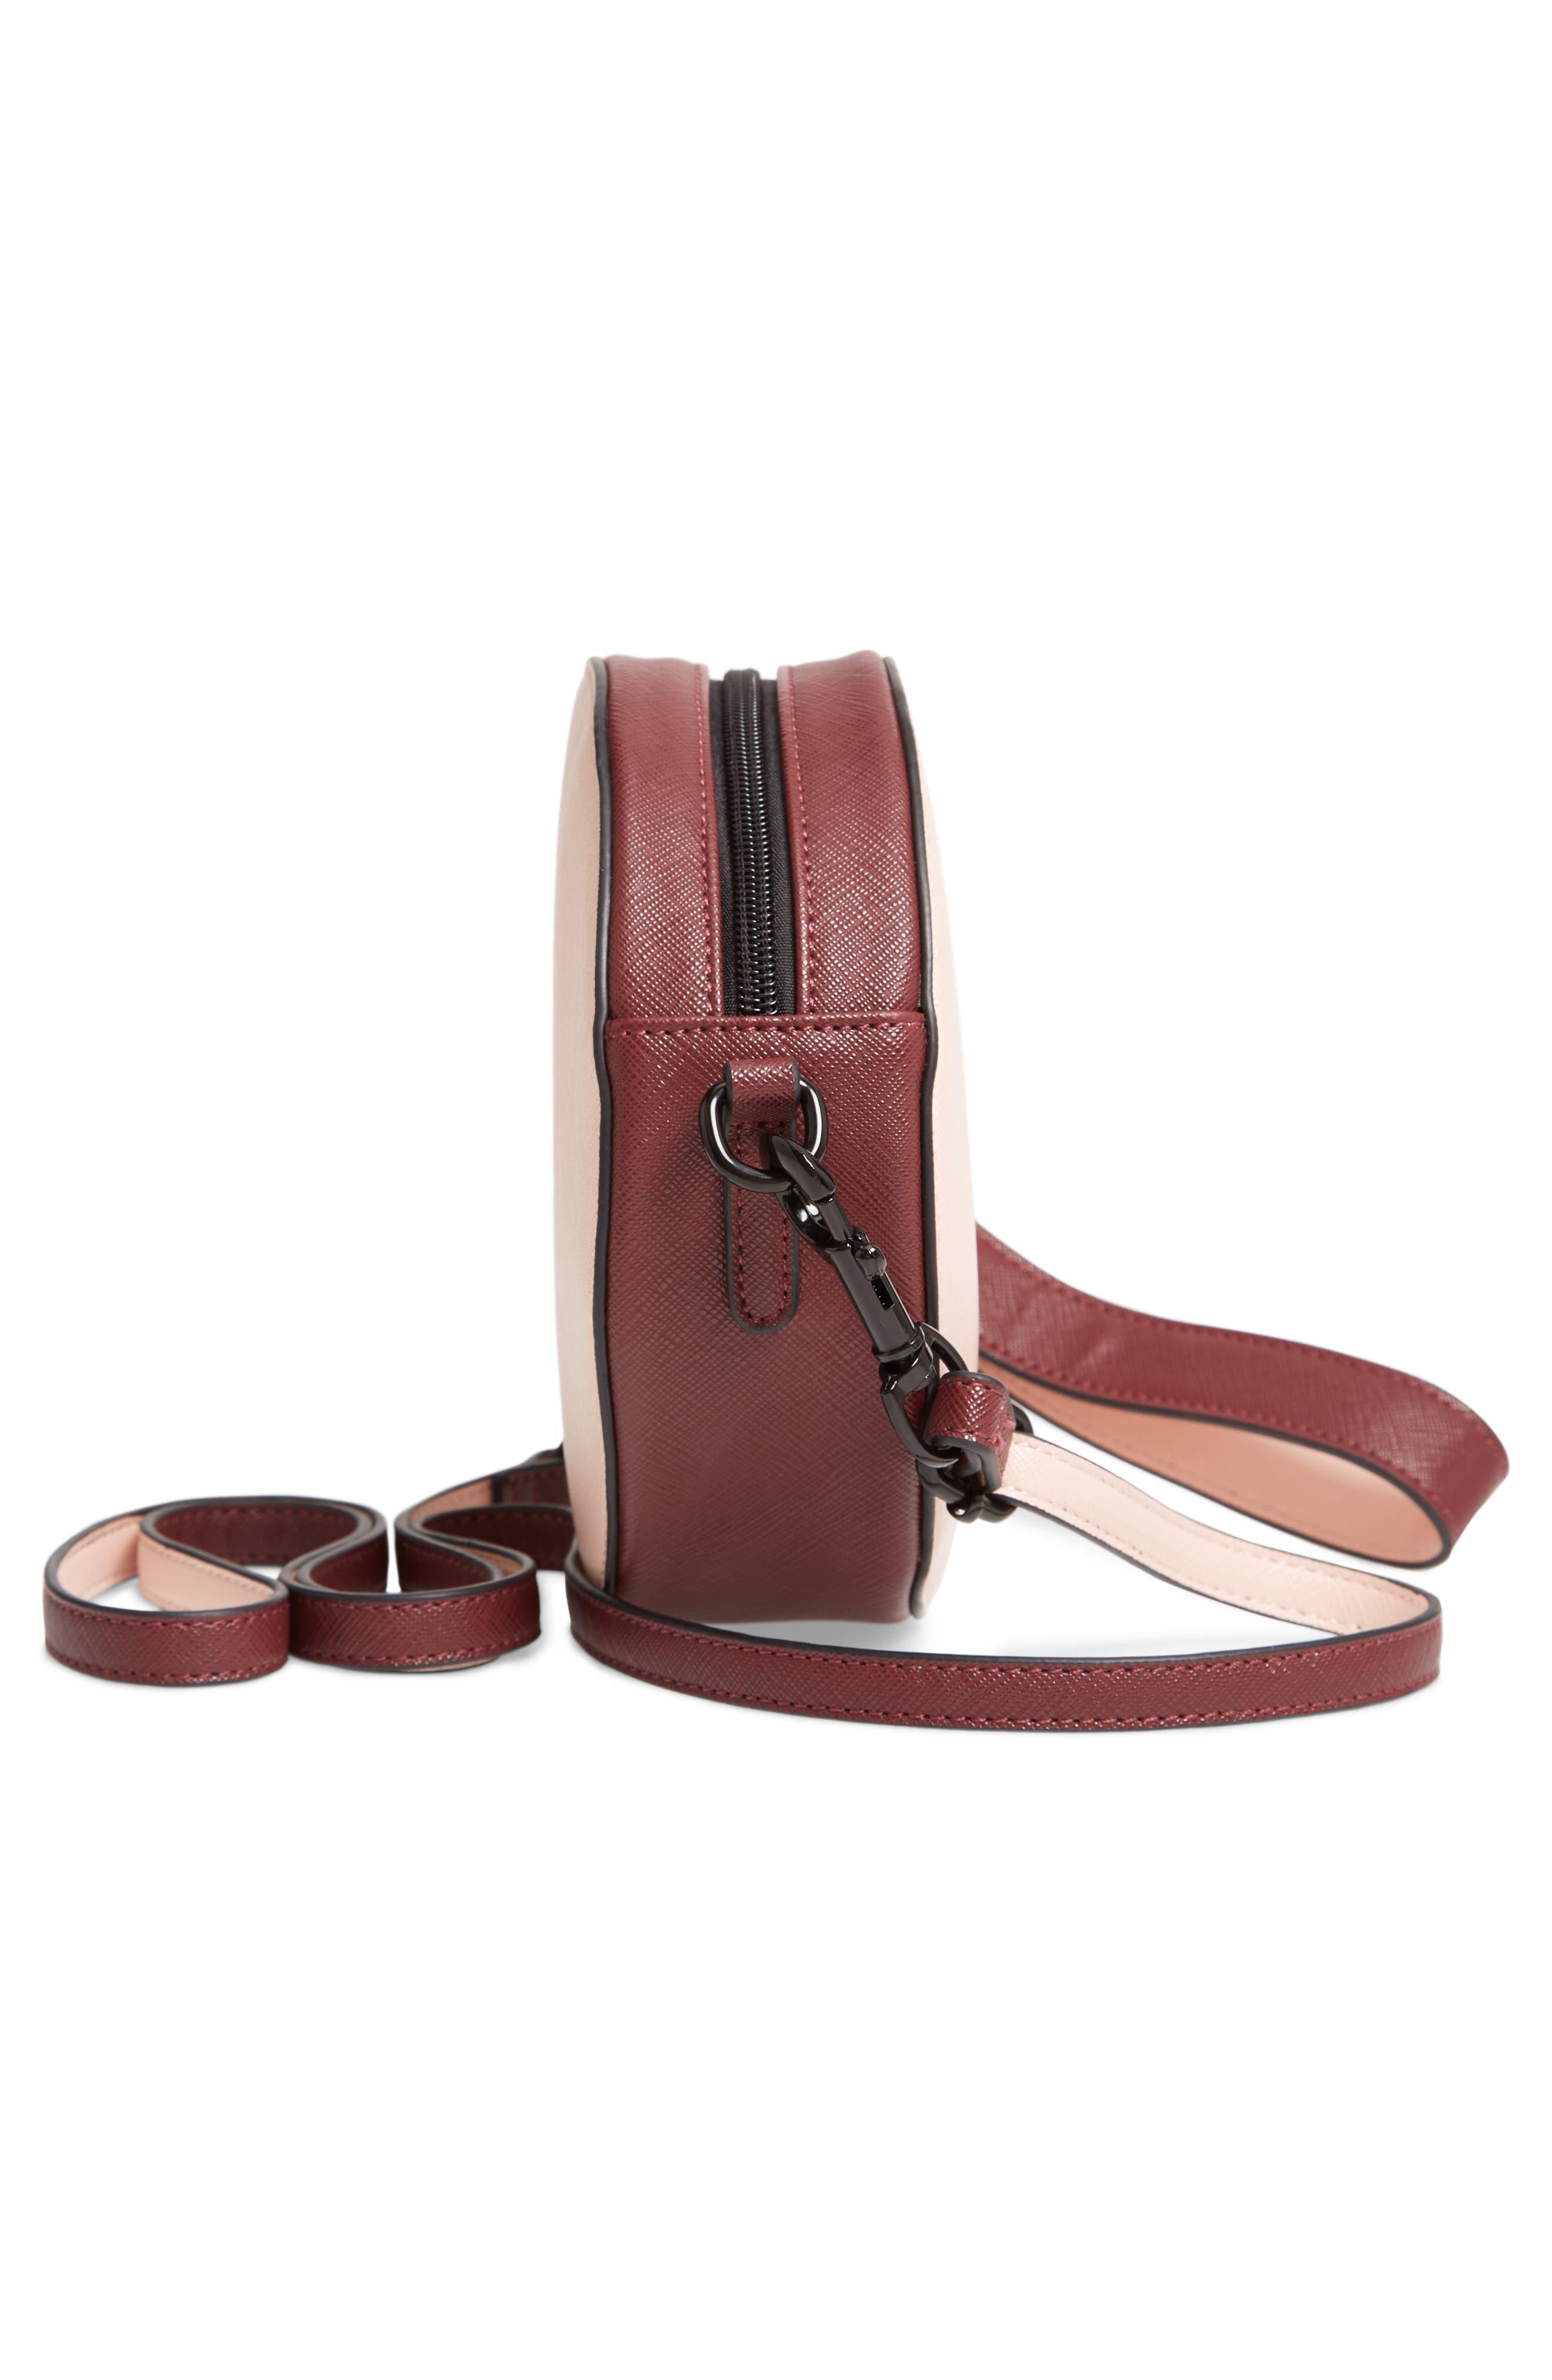 T-SHIRT & JEANS, Faux Leather Colorblock Canteen Crossbody Bag, Alternate thumbnail 7, color, 650